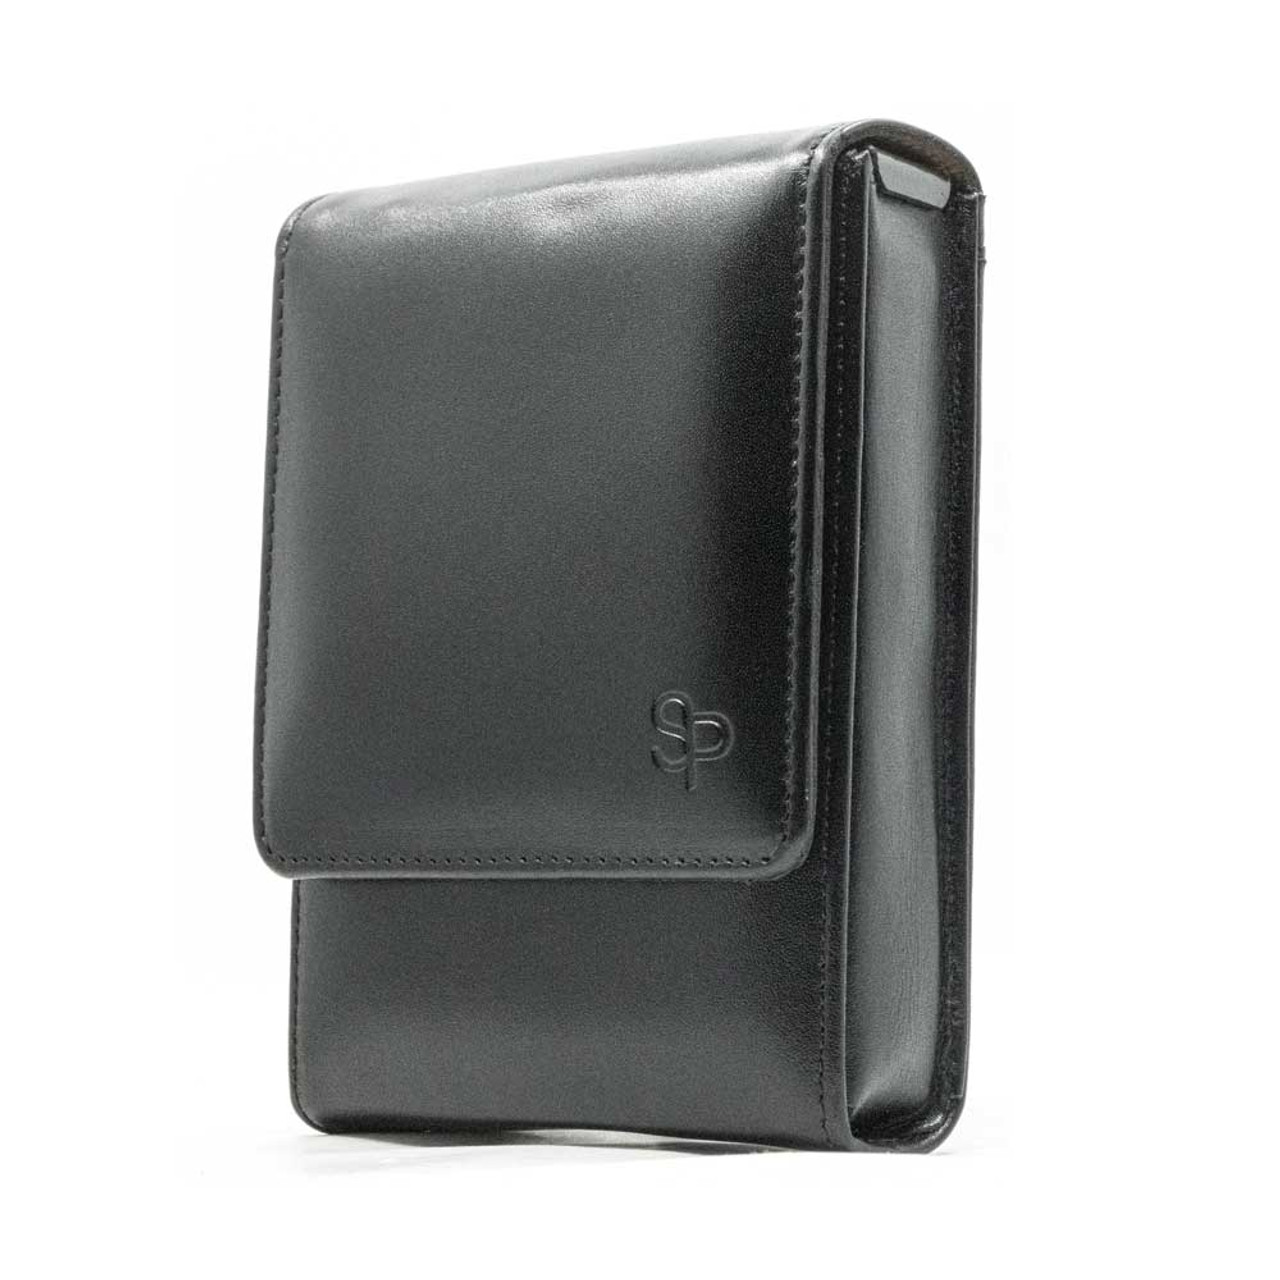 HK VP9 Black Leather Holster